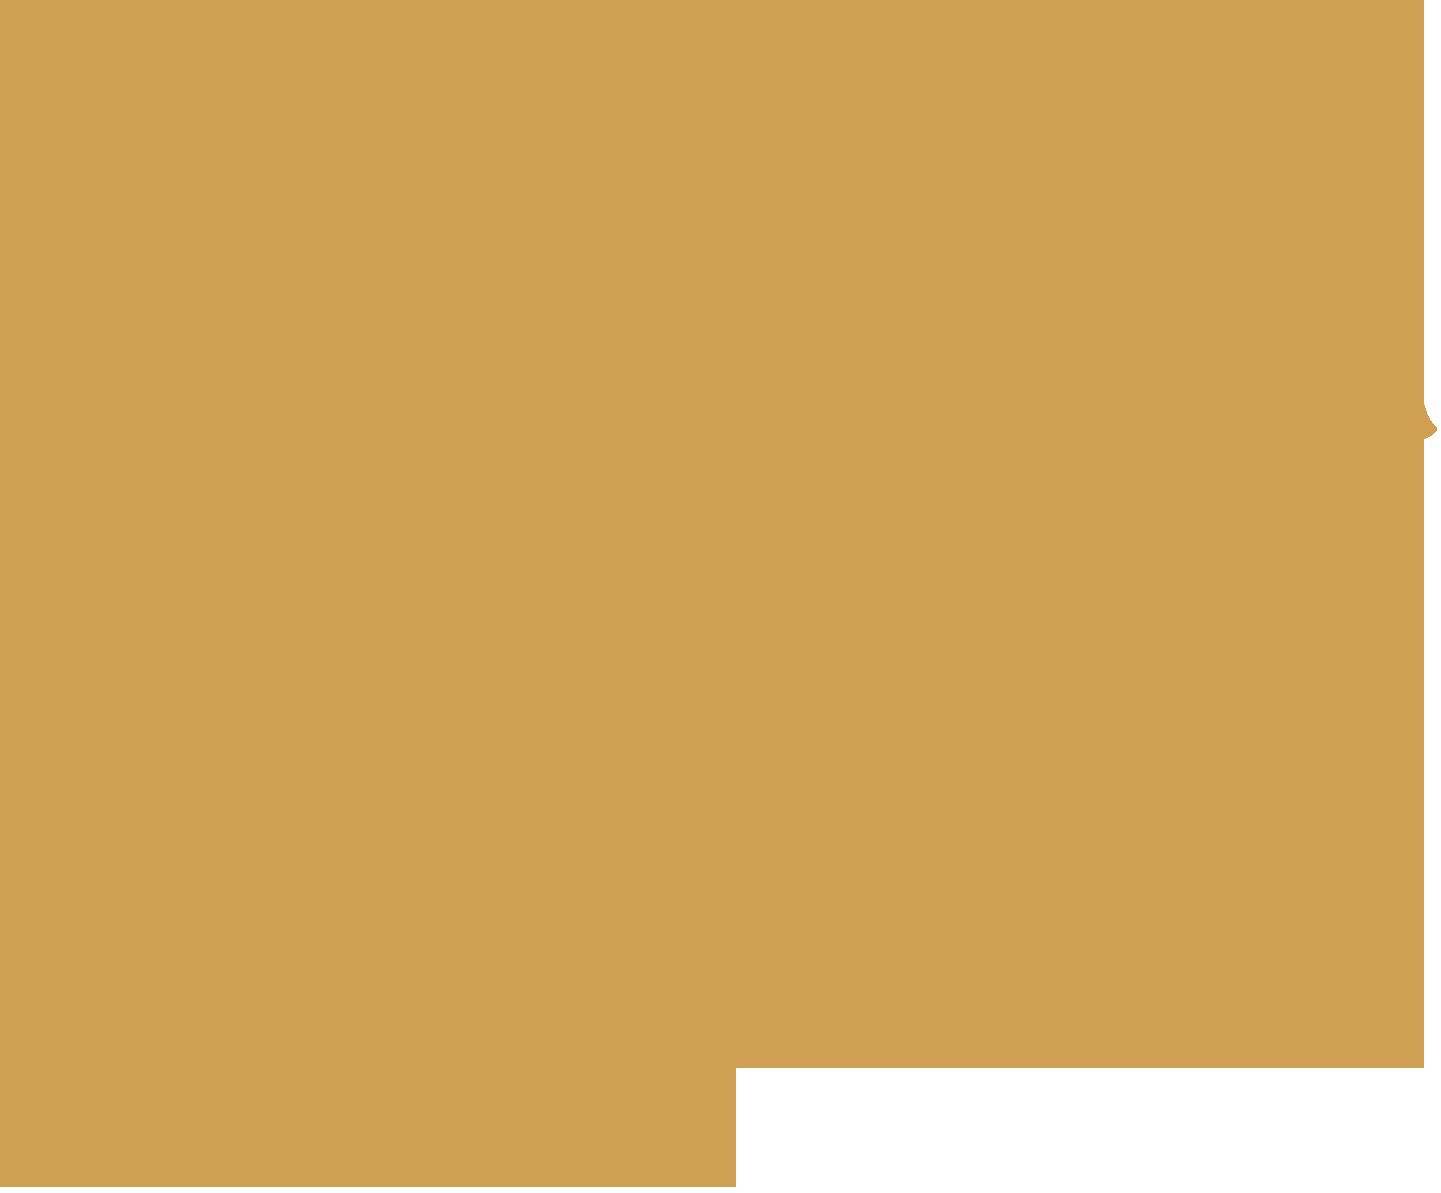 DMC Andorra map